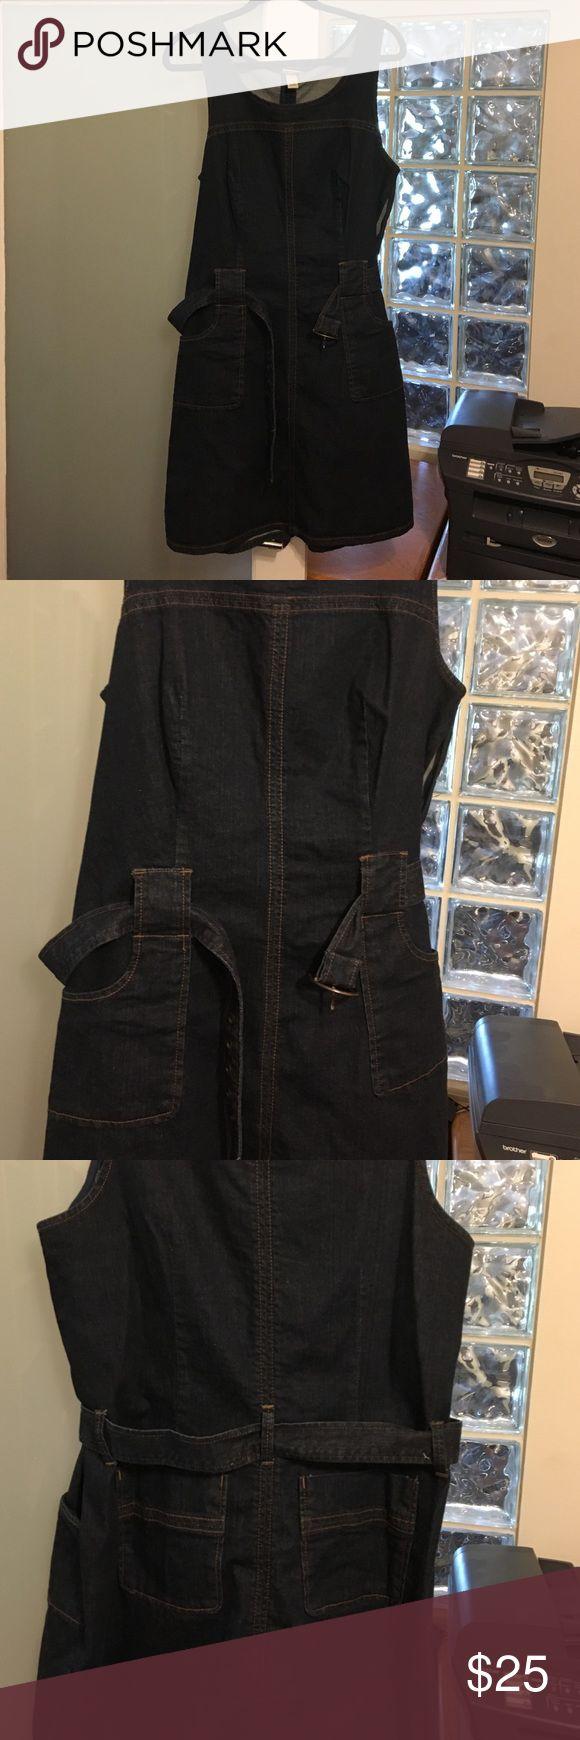 Dark Denim dress by Venizia Dark denim dress by Venezia.  Pocket details on front and back.  Belted.  Size 14.  Stretch denim.  Size 14.  Worn once. Venizia Dresses Mini